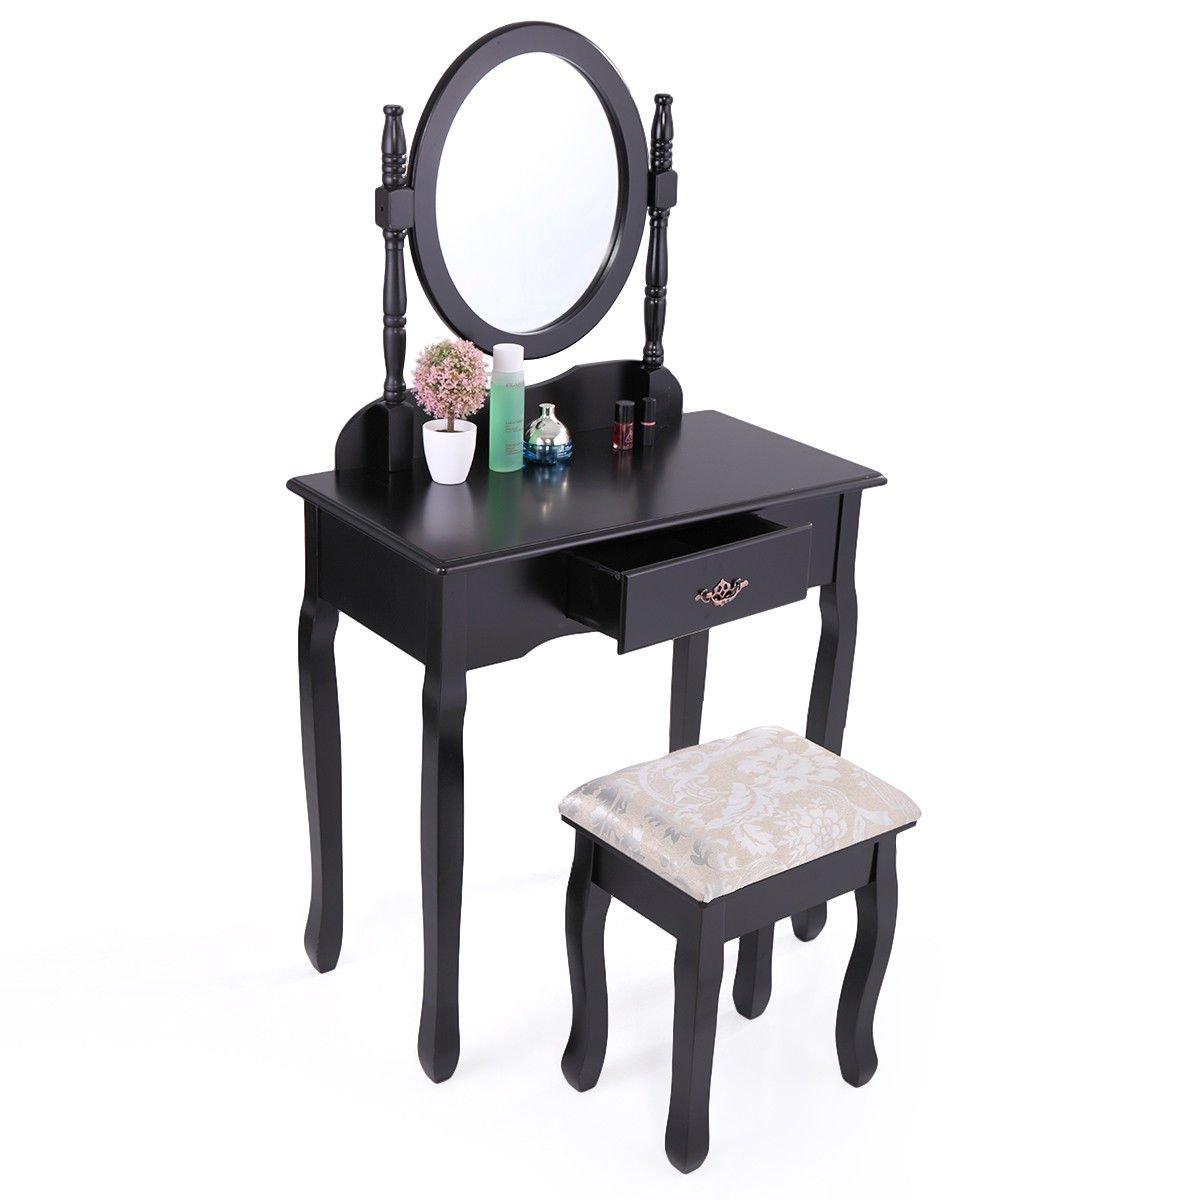 Tobbi Vanity Mirror Table Set Make up Wood Chair Desk With Stool Bench Black